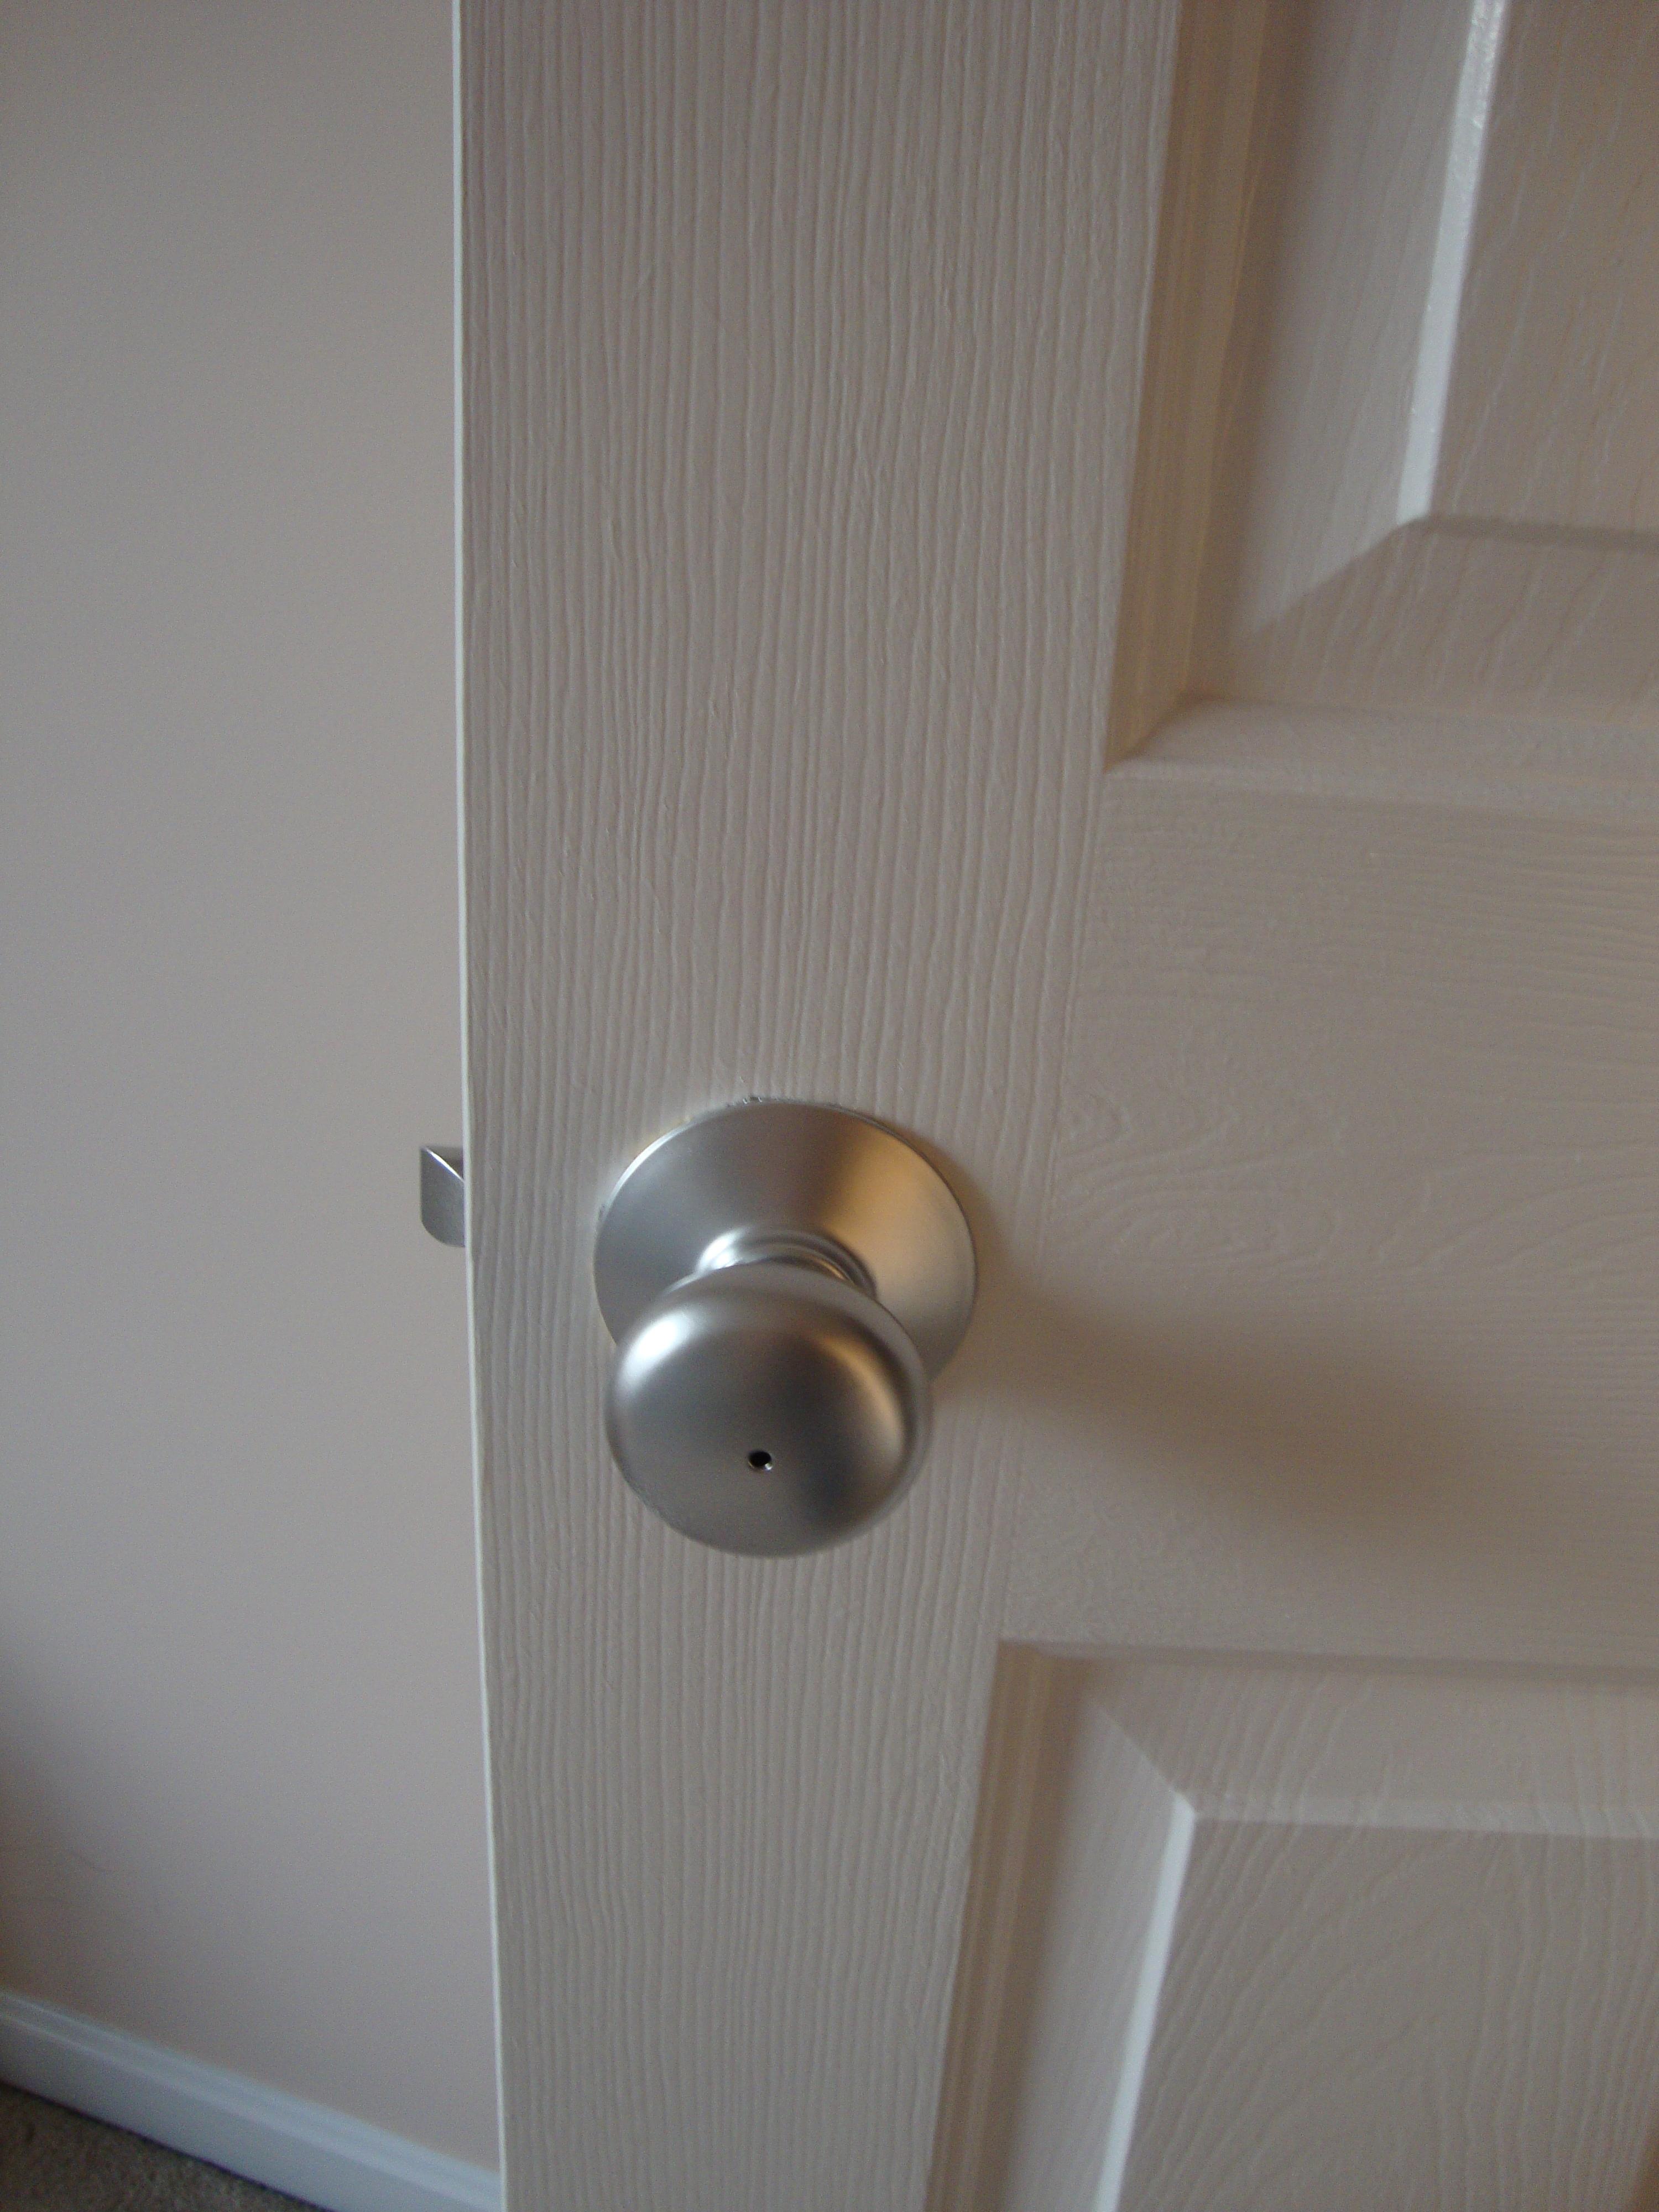 used door knobs photo - 13